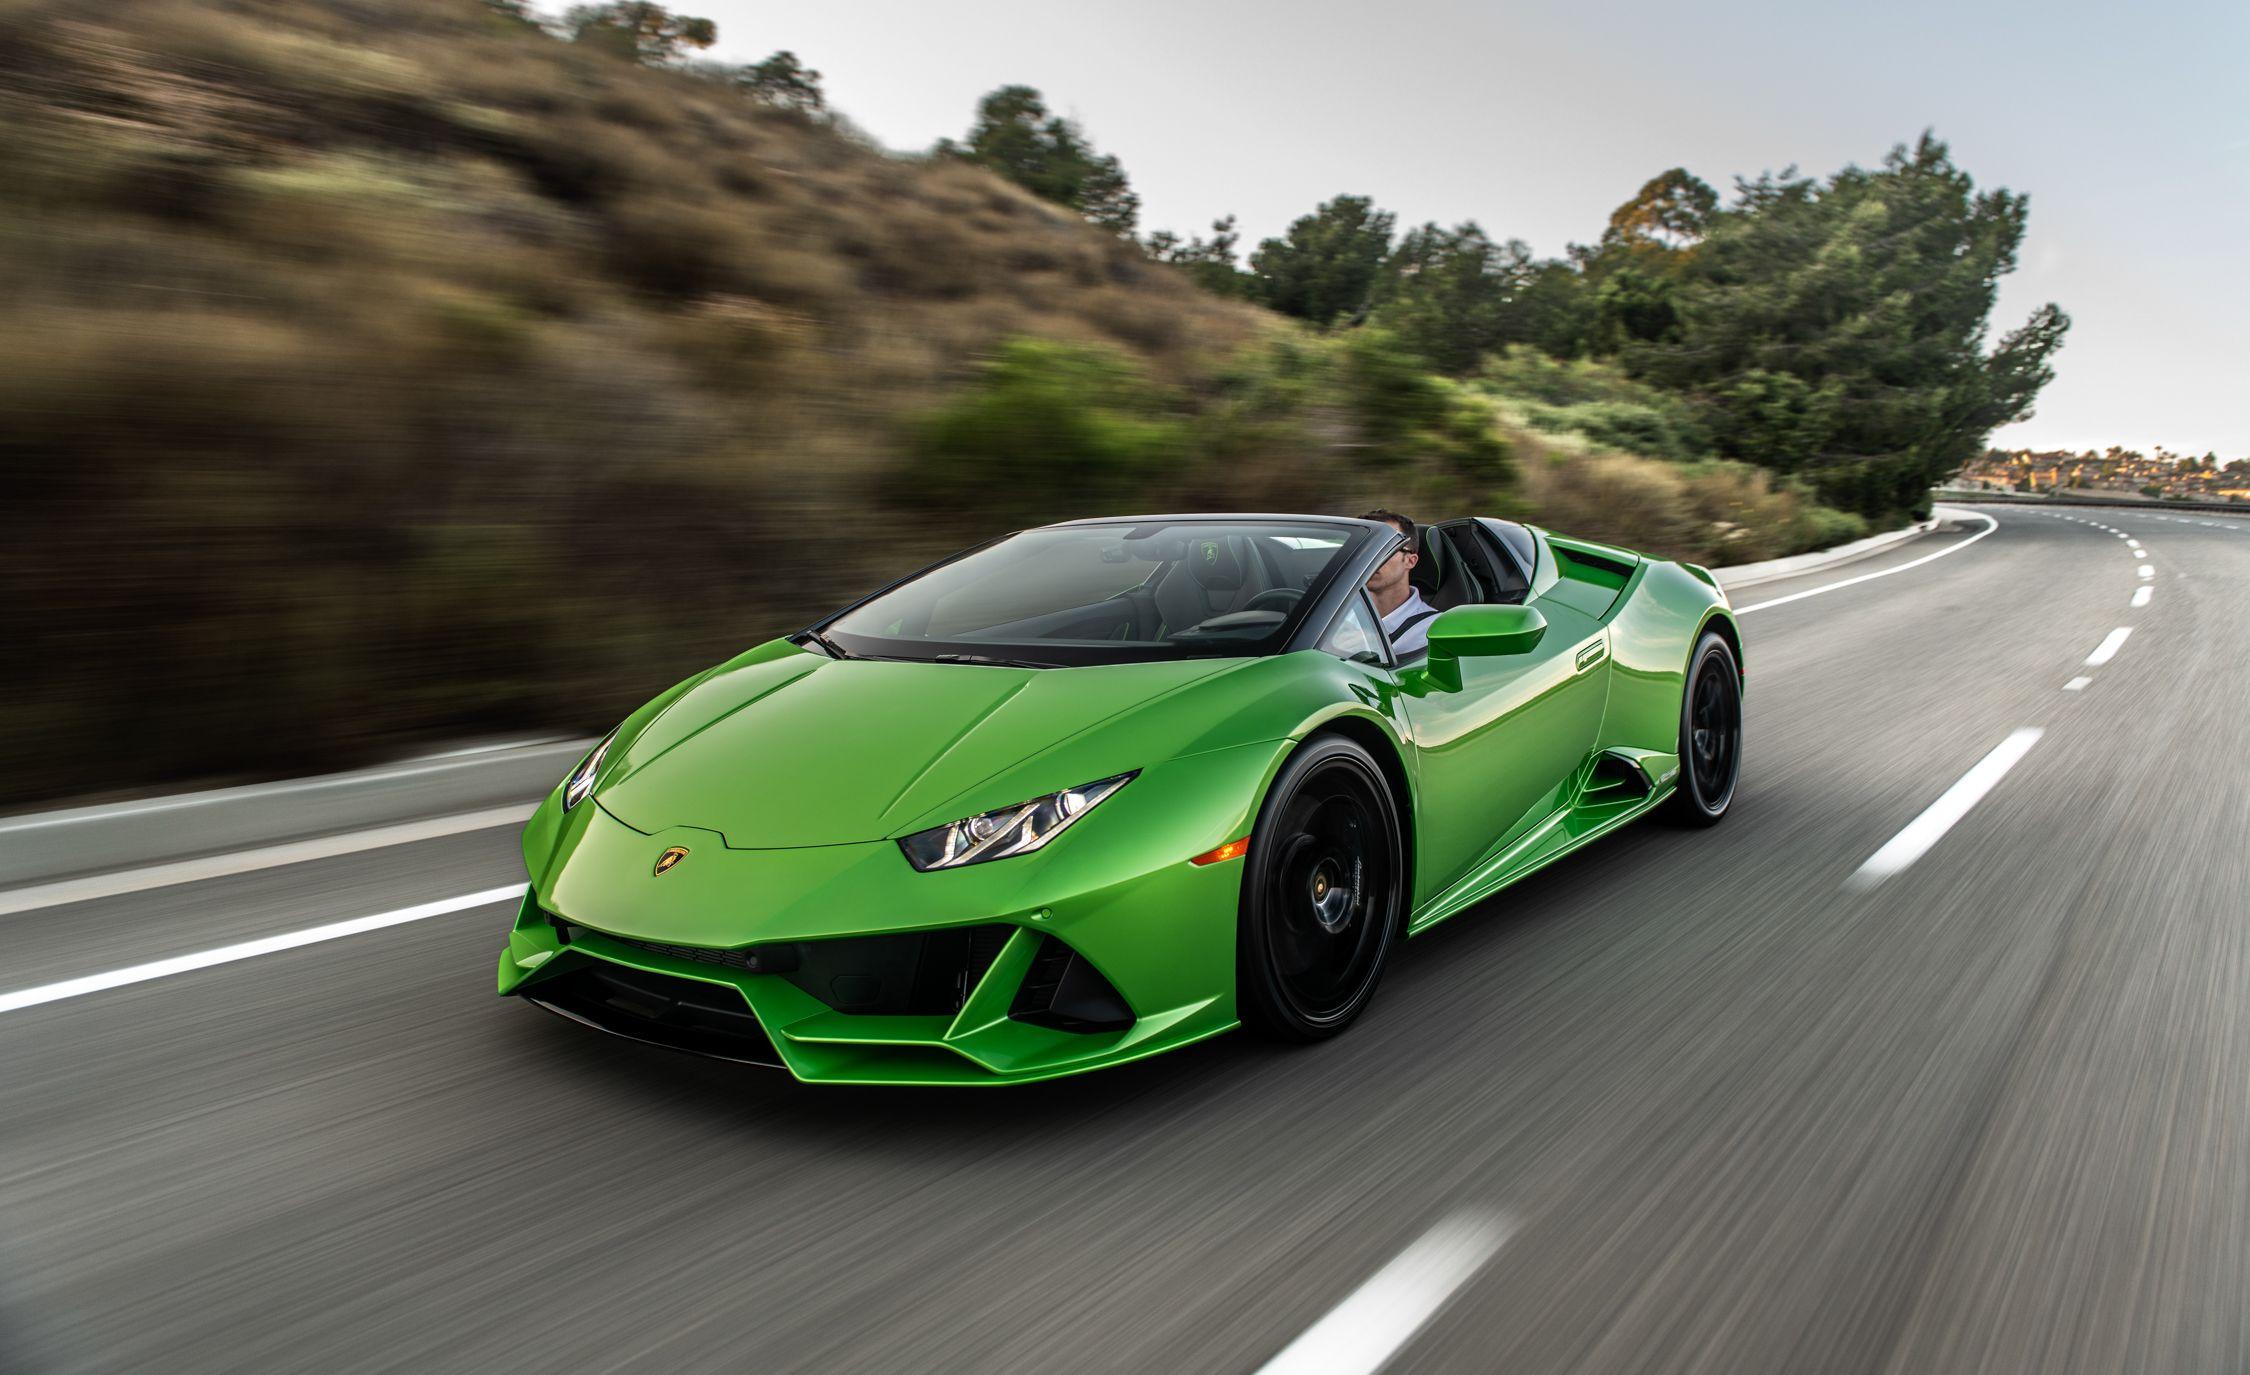 2020 Lamborghini Huracán Evo Spyder Is Pure Open,Air Excess